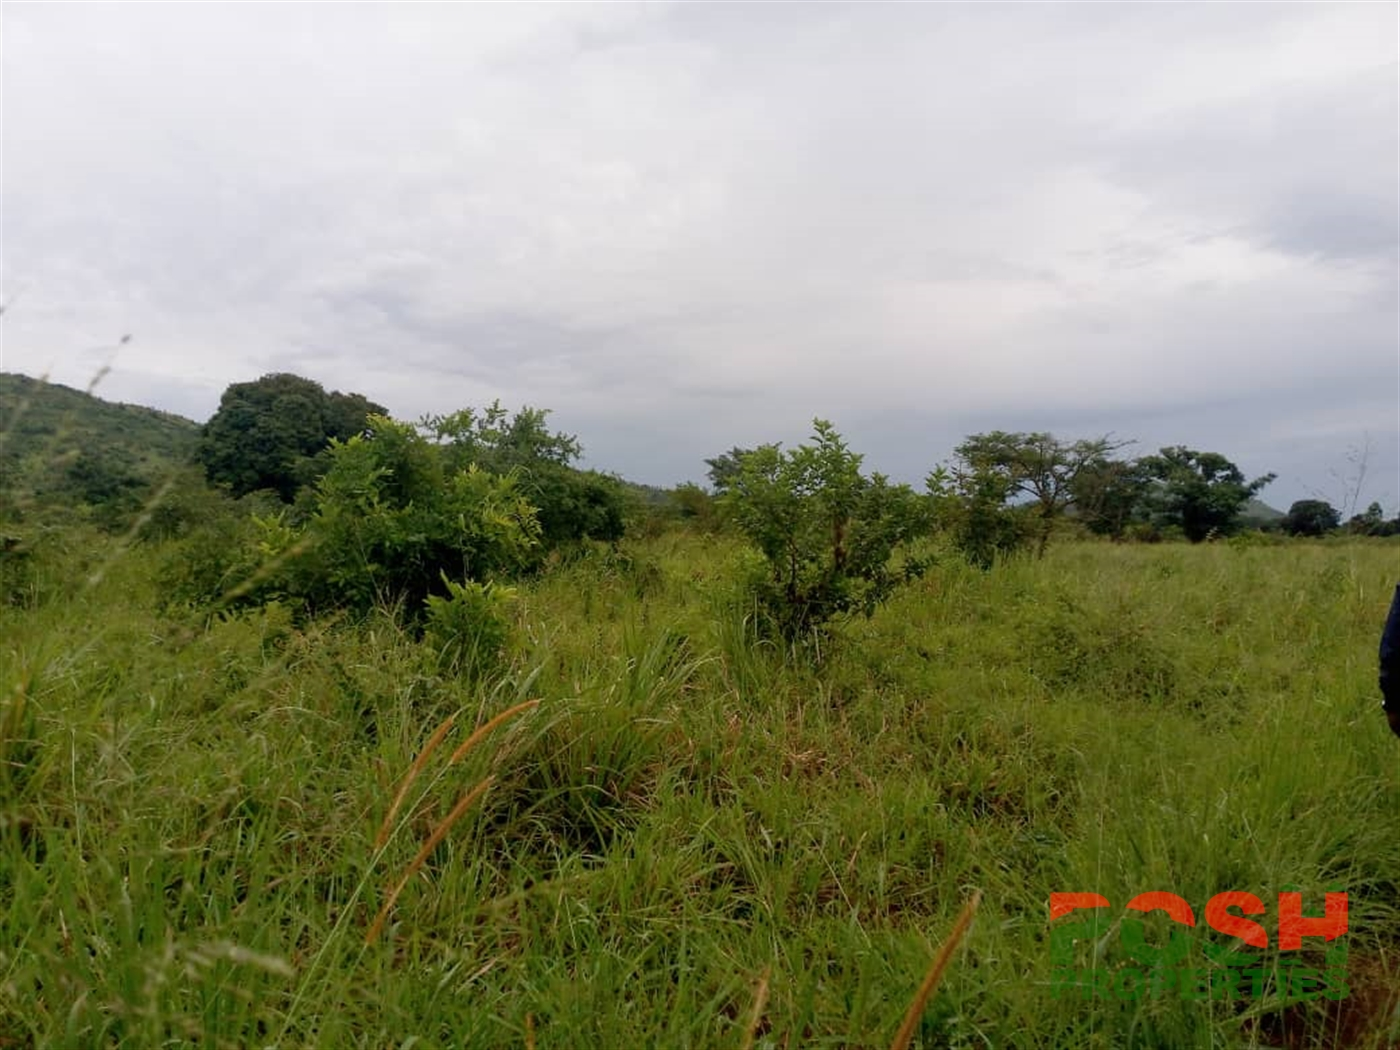 Commercial Land for sale in Lwamata Kiboga